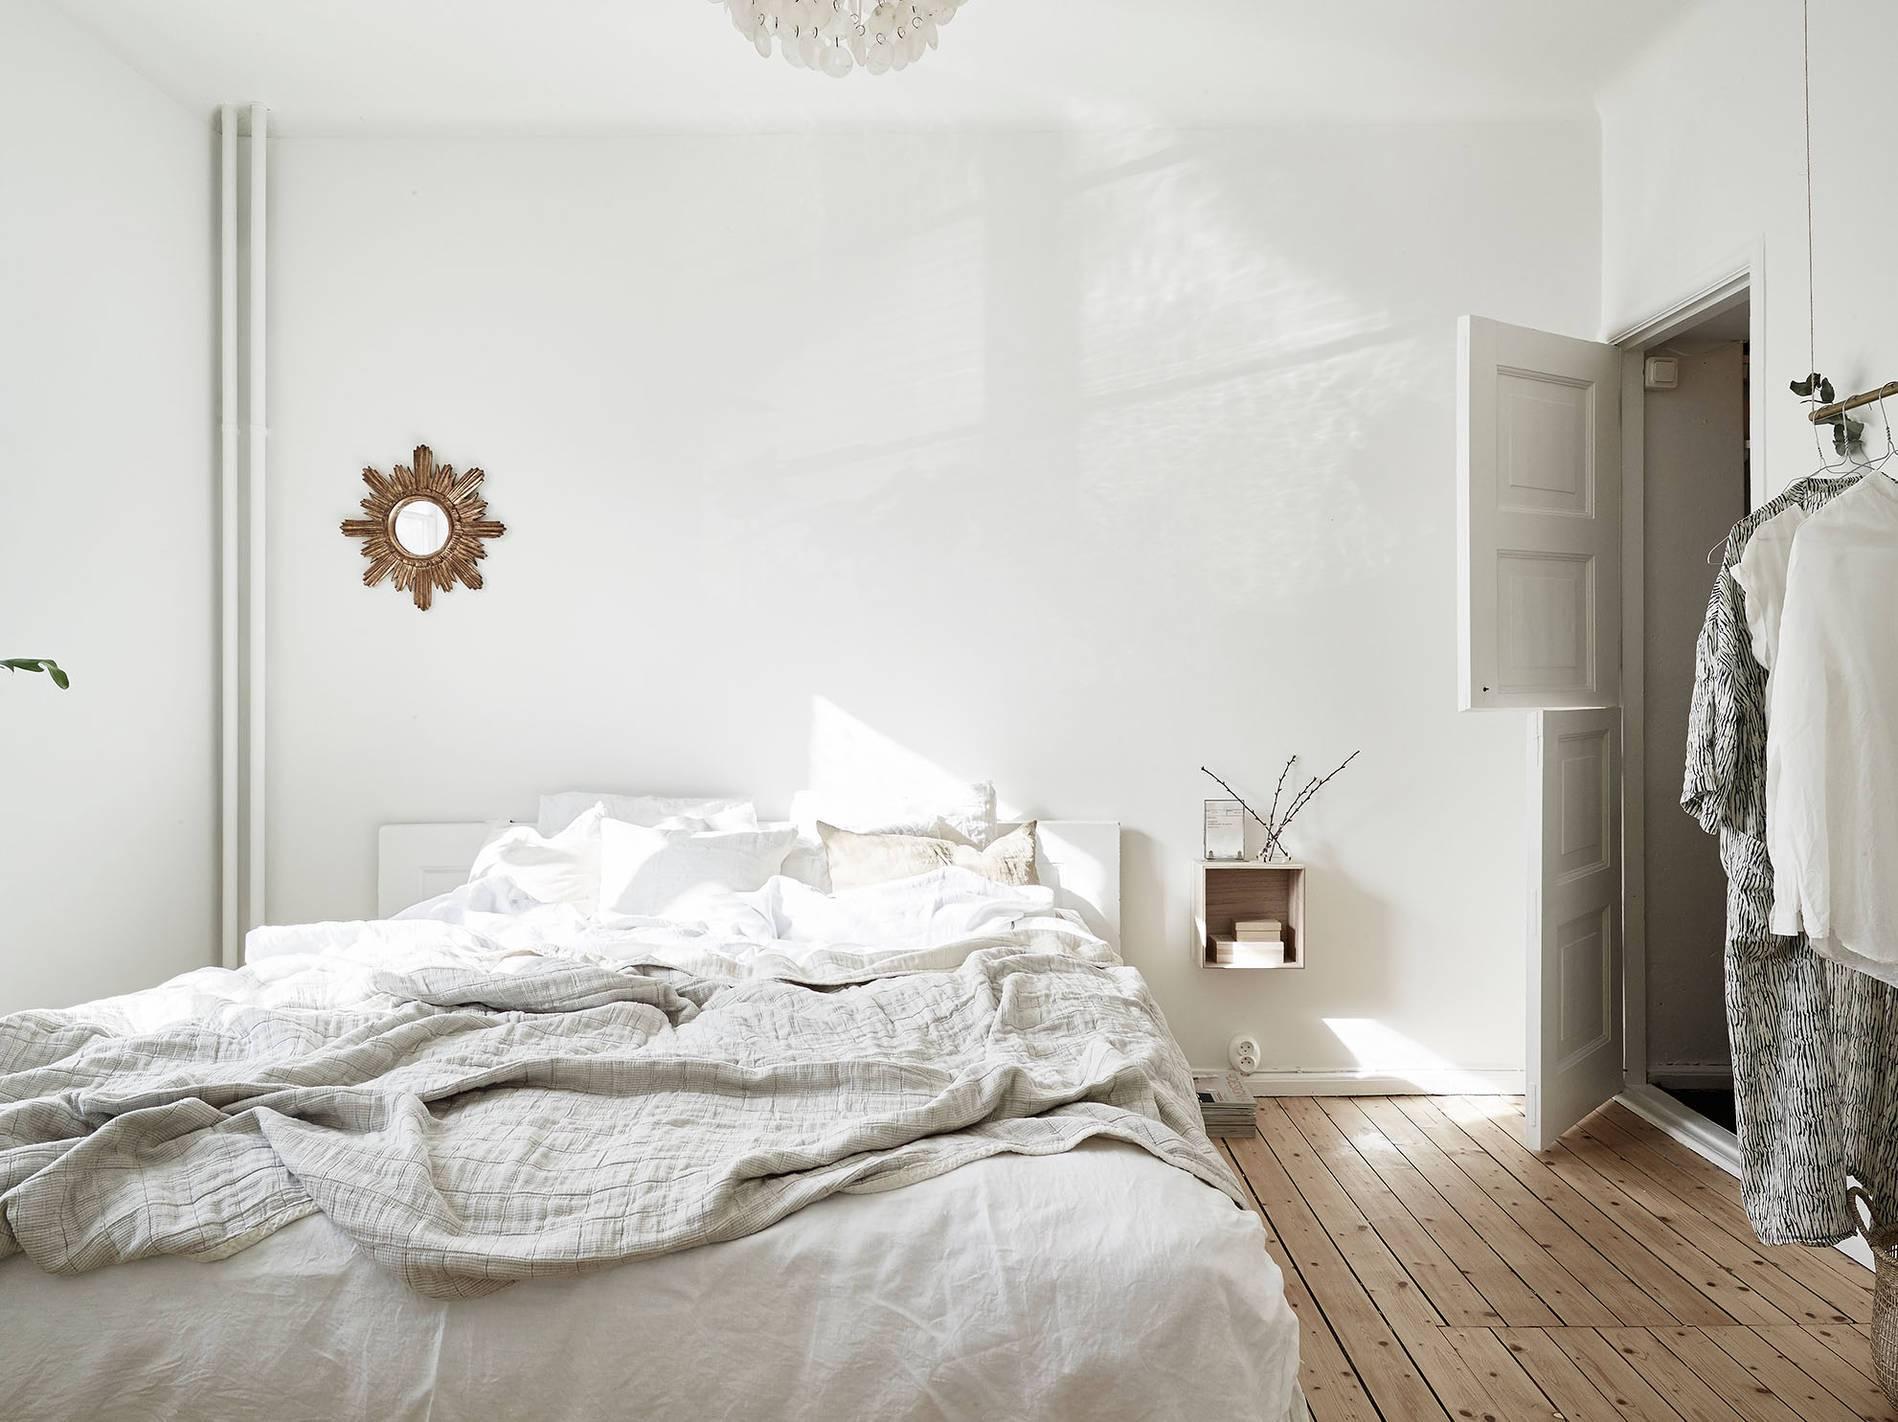 interiorlines_bezs_minimal_6.jpg